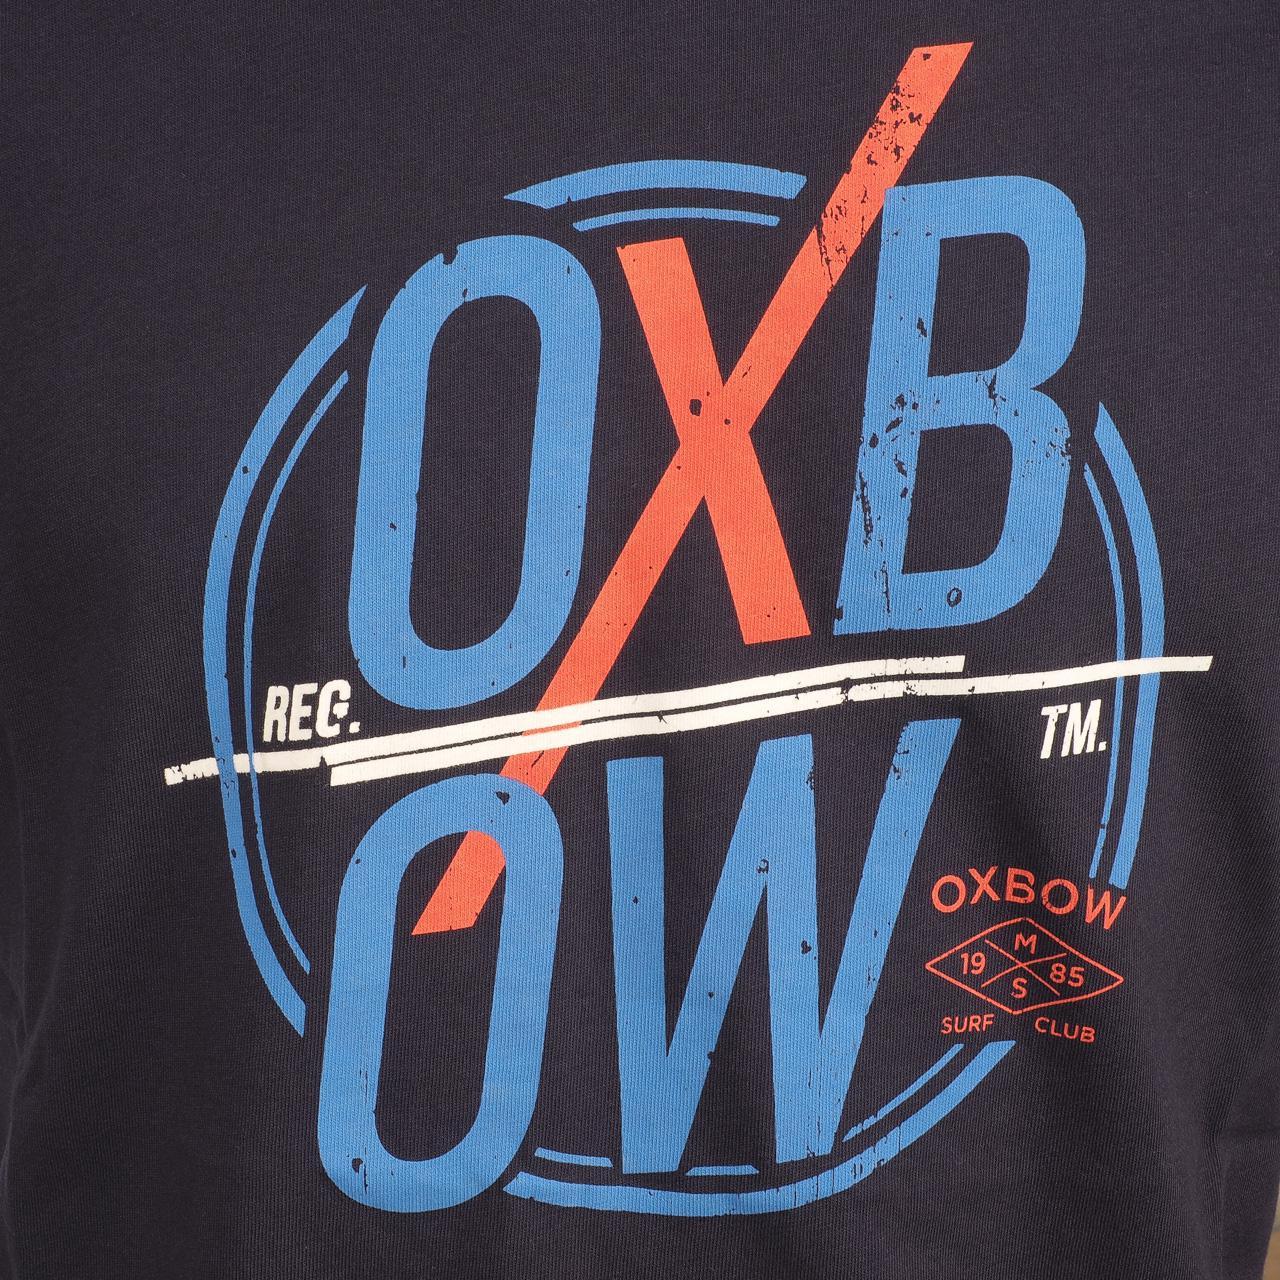 Short-Oxbow-Sanfre-Navy-Mc-Oxbow-Blue-47169-New thumbnail 3